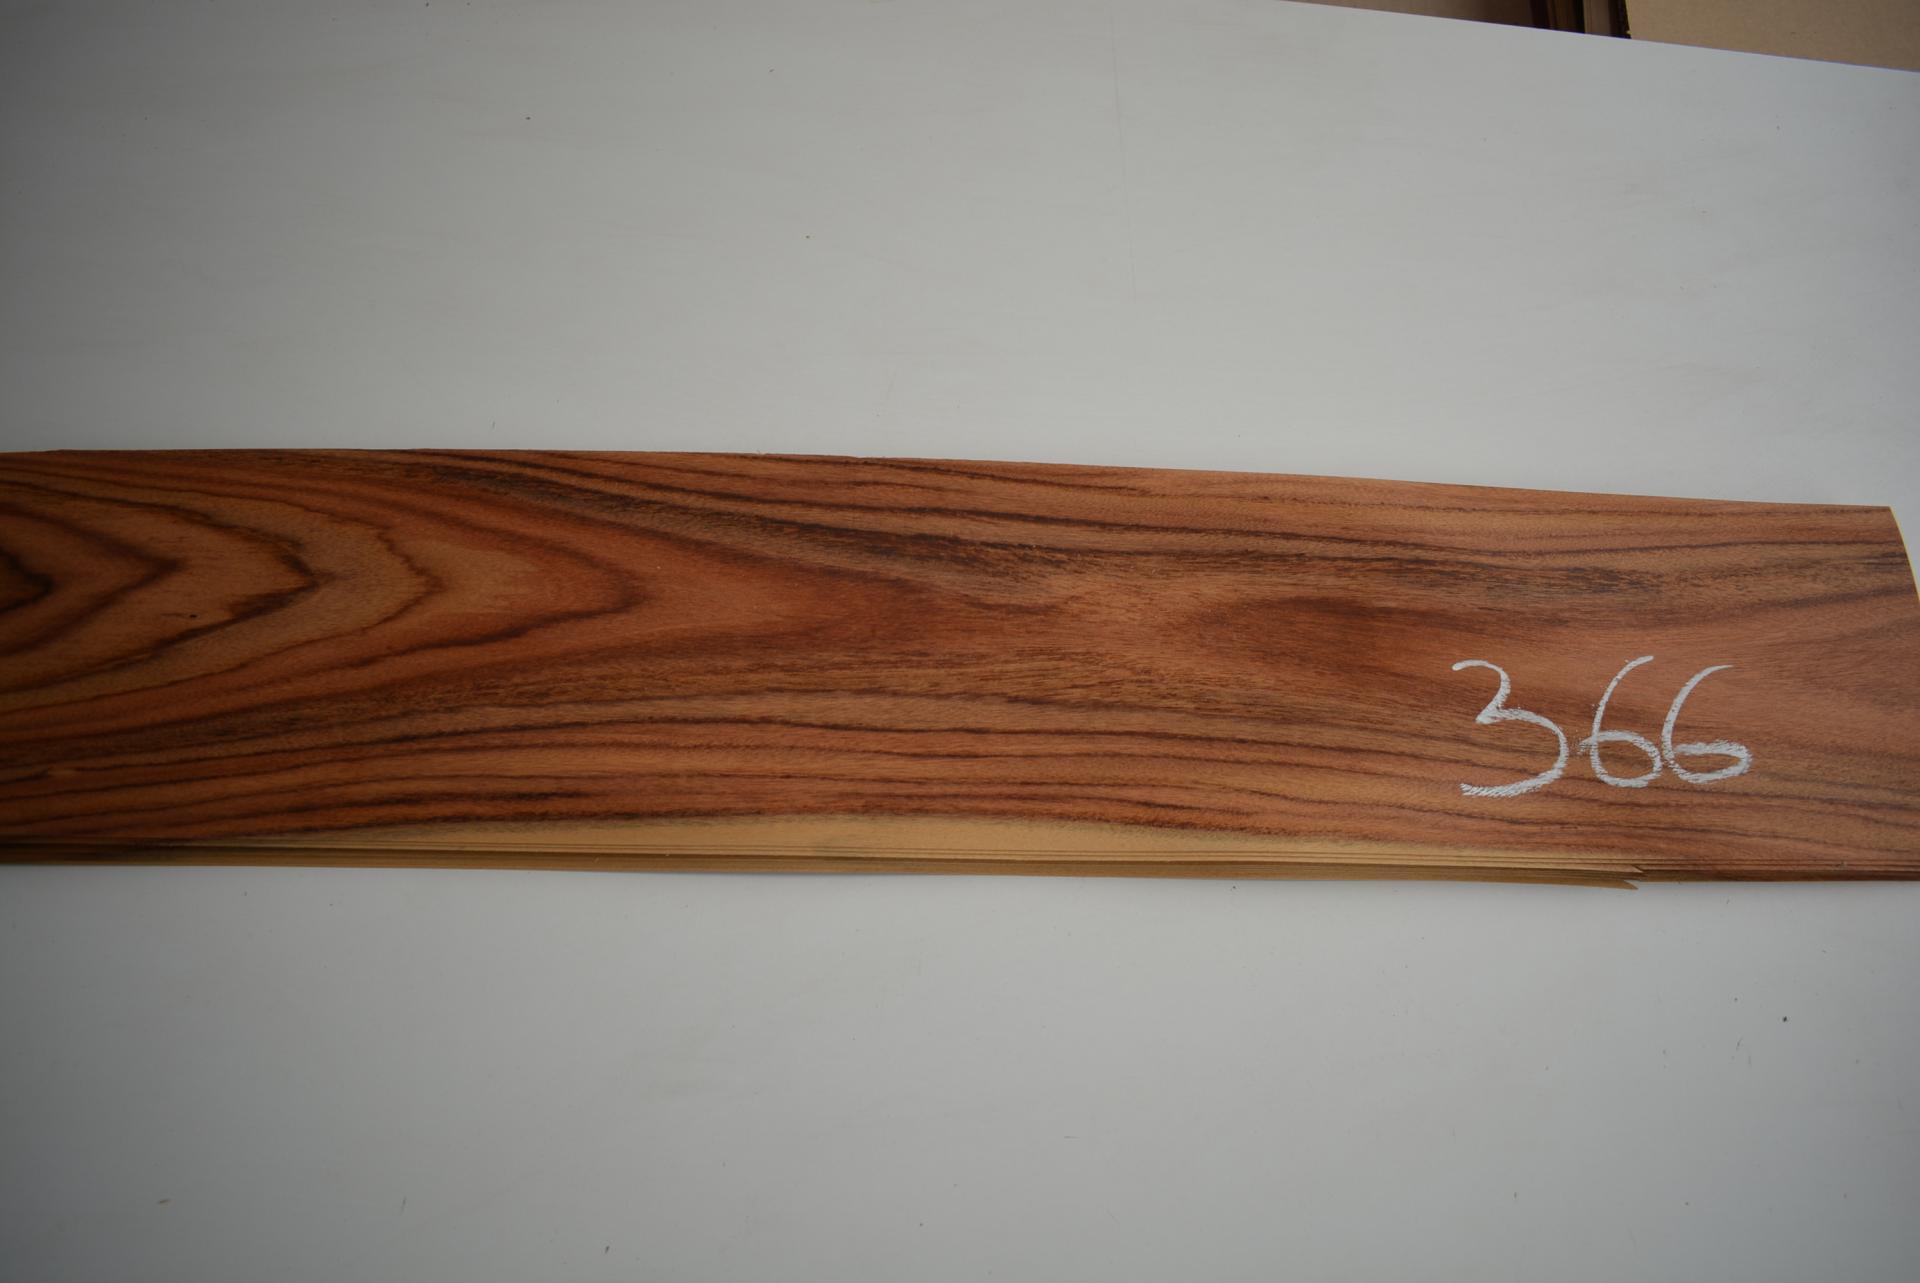 366 placage palissandre santos marqueterie 1